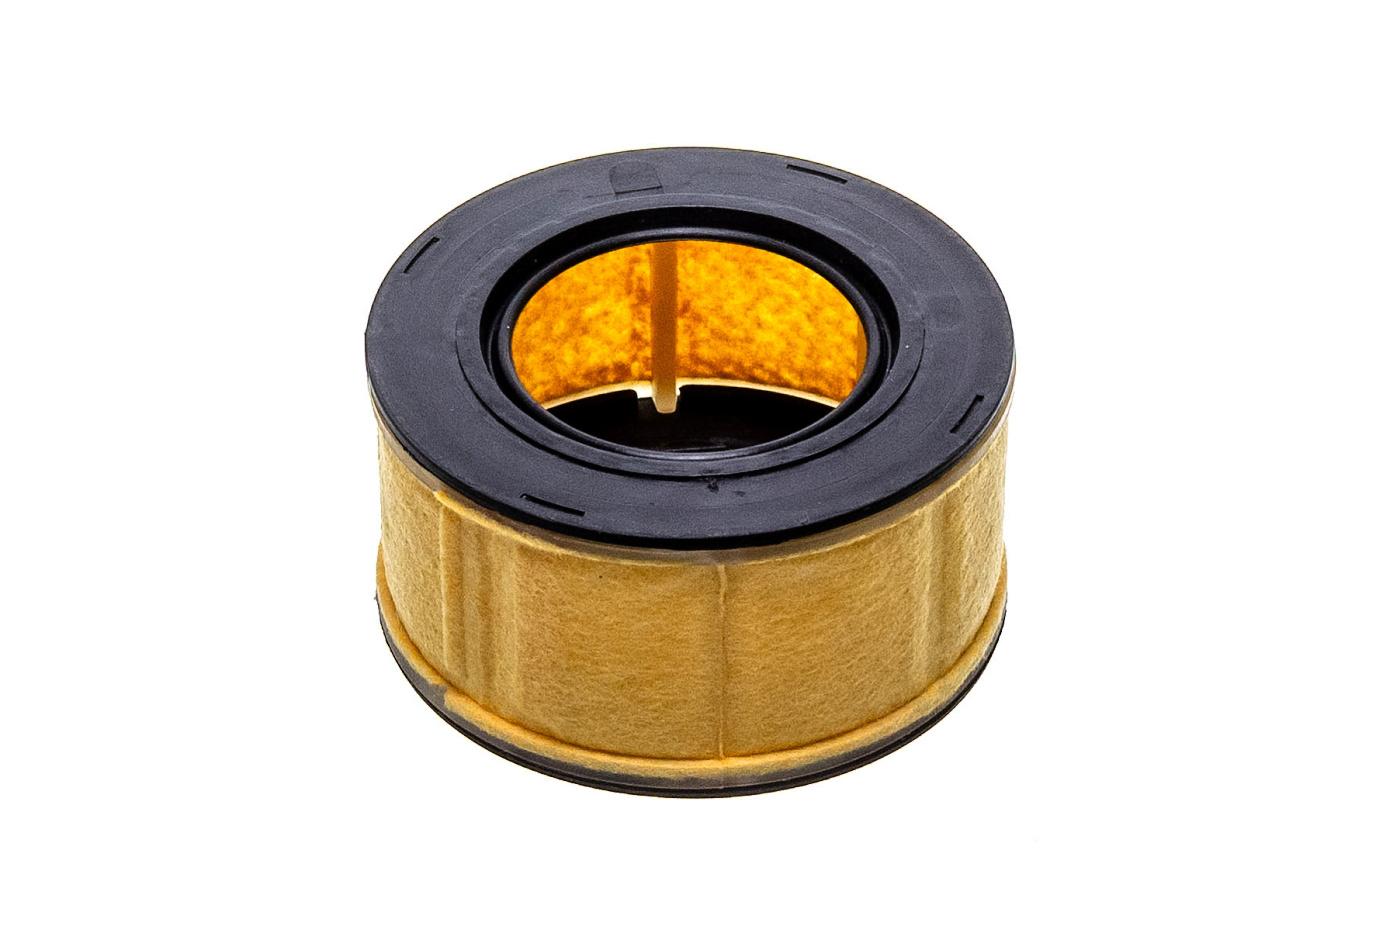 Vzduchový filtr Stihl MS231 MS251 MS271 MS291 MS311 MS391 - 11411201600